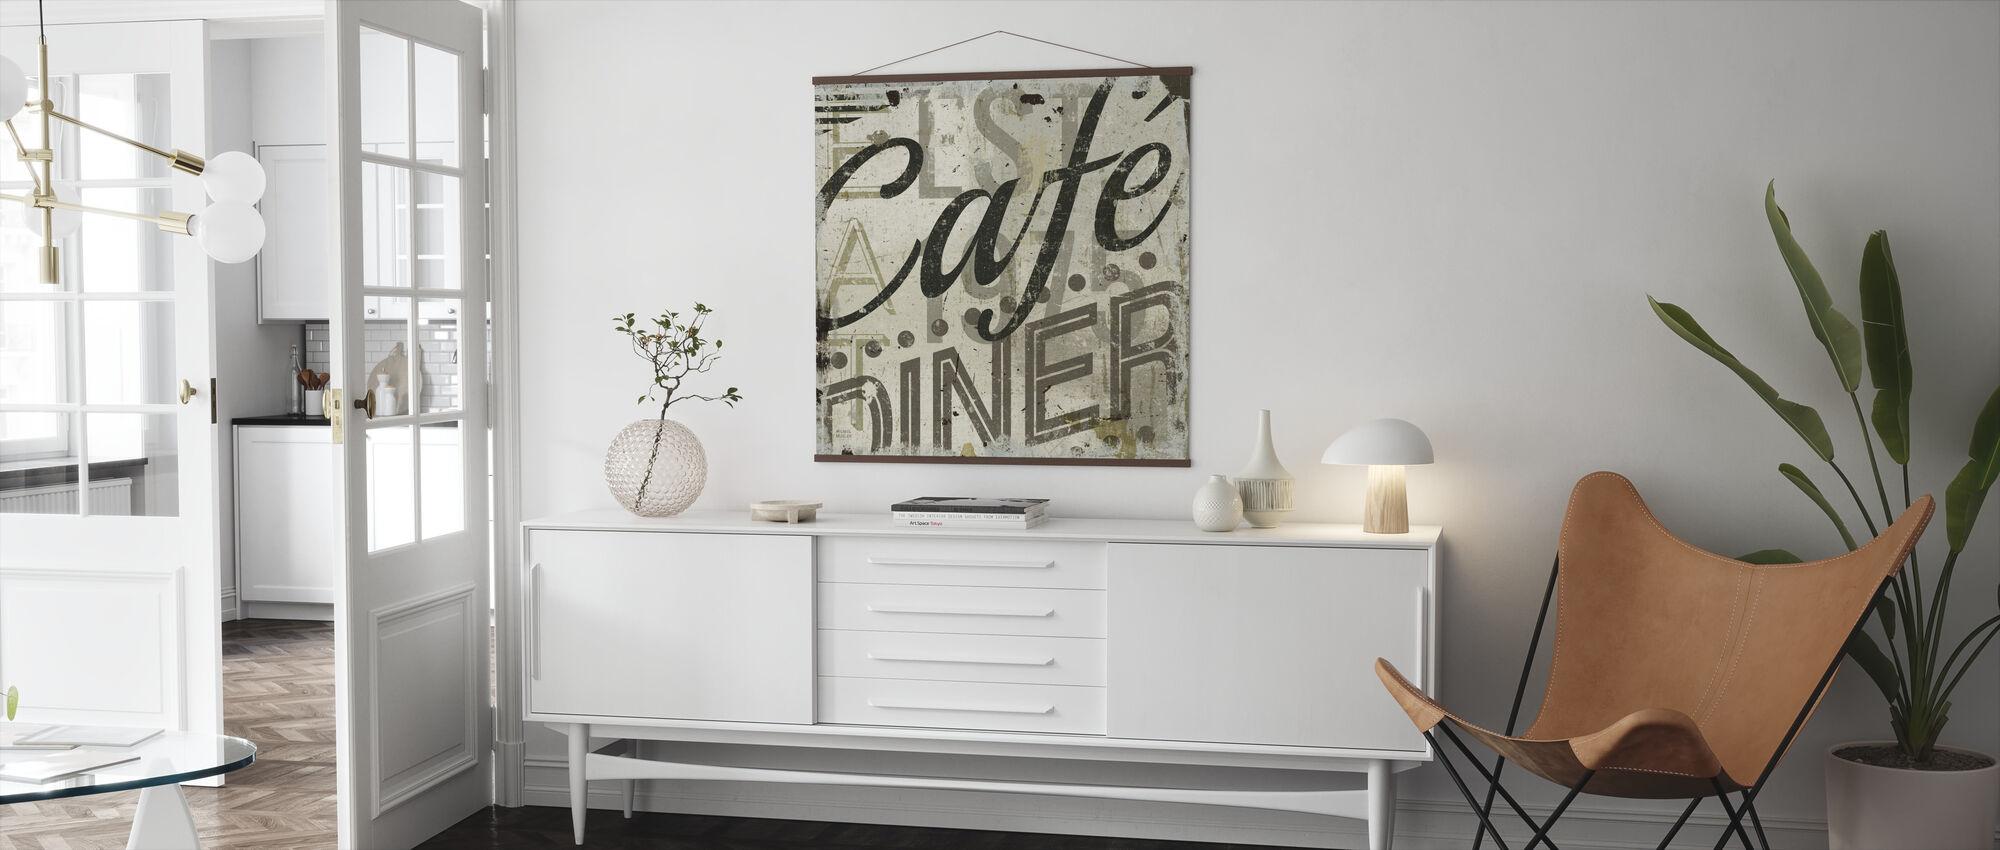 Restaurant Sign II - Poster - Living Room